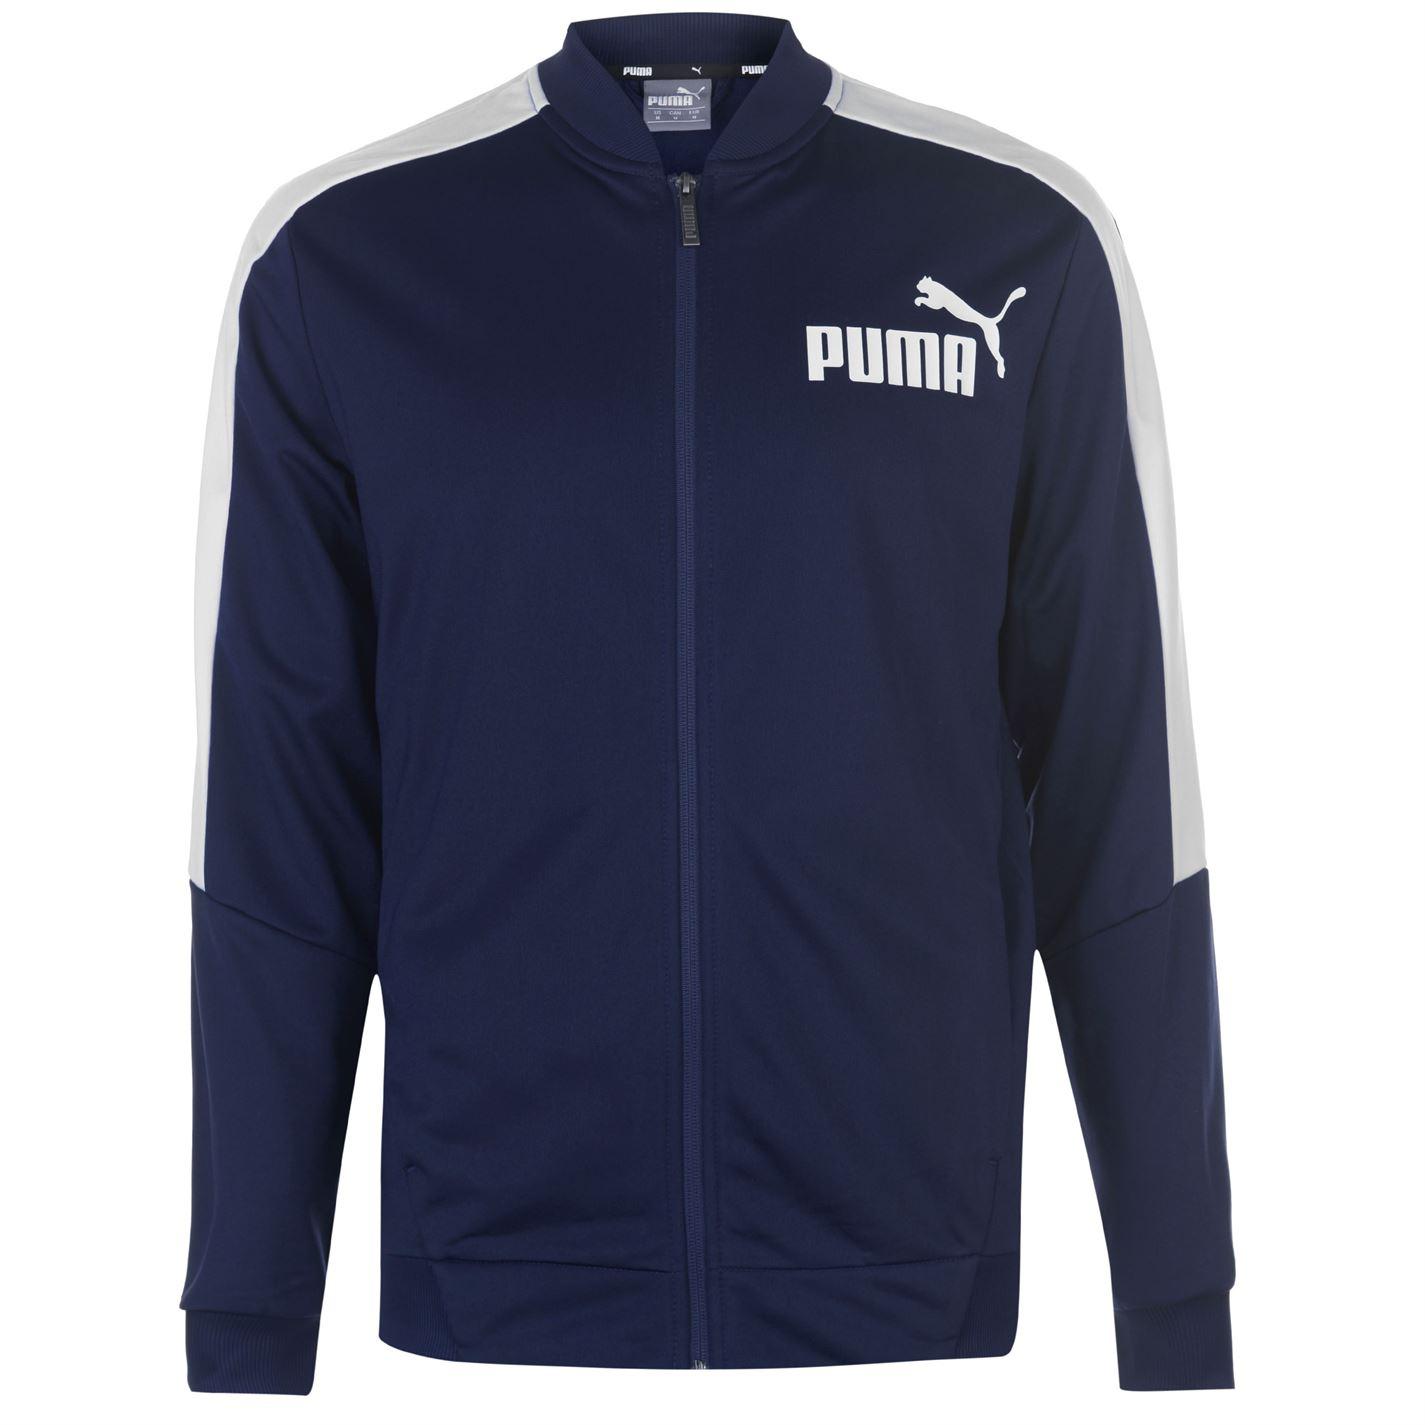 Puma Mens Poly Tracksuit - £39.74 at arcade-london eBay